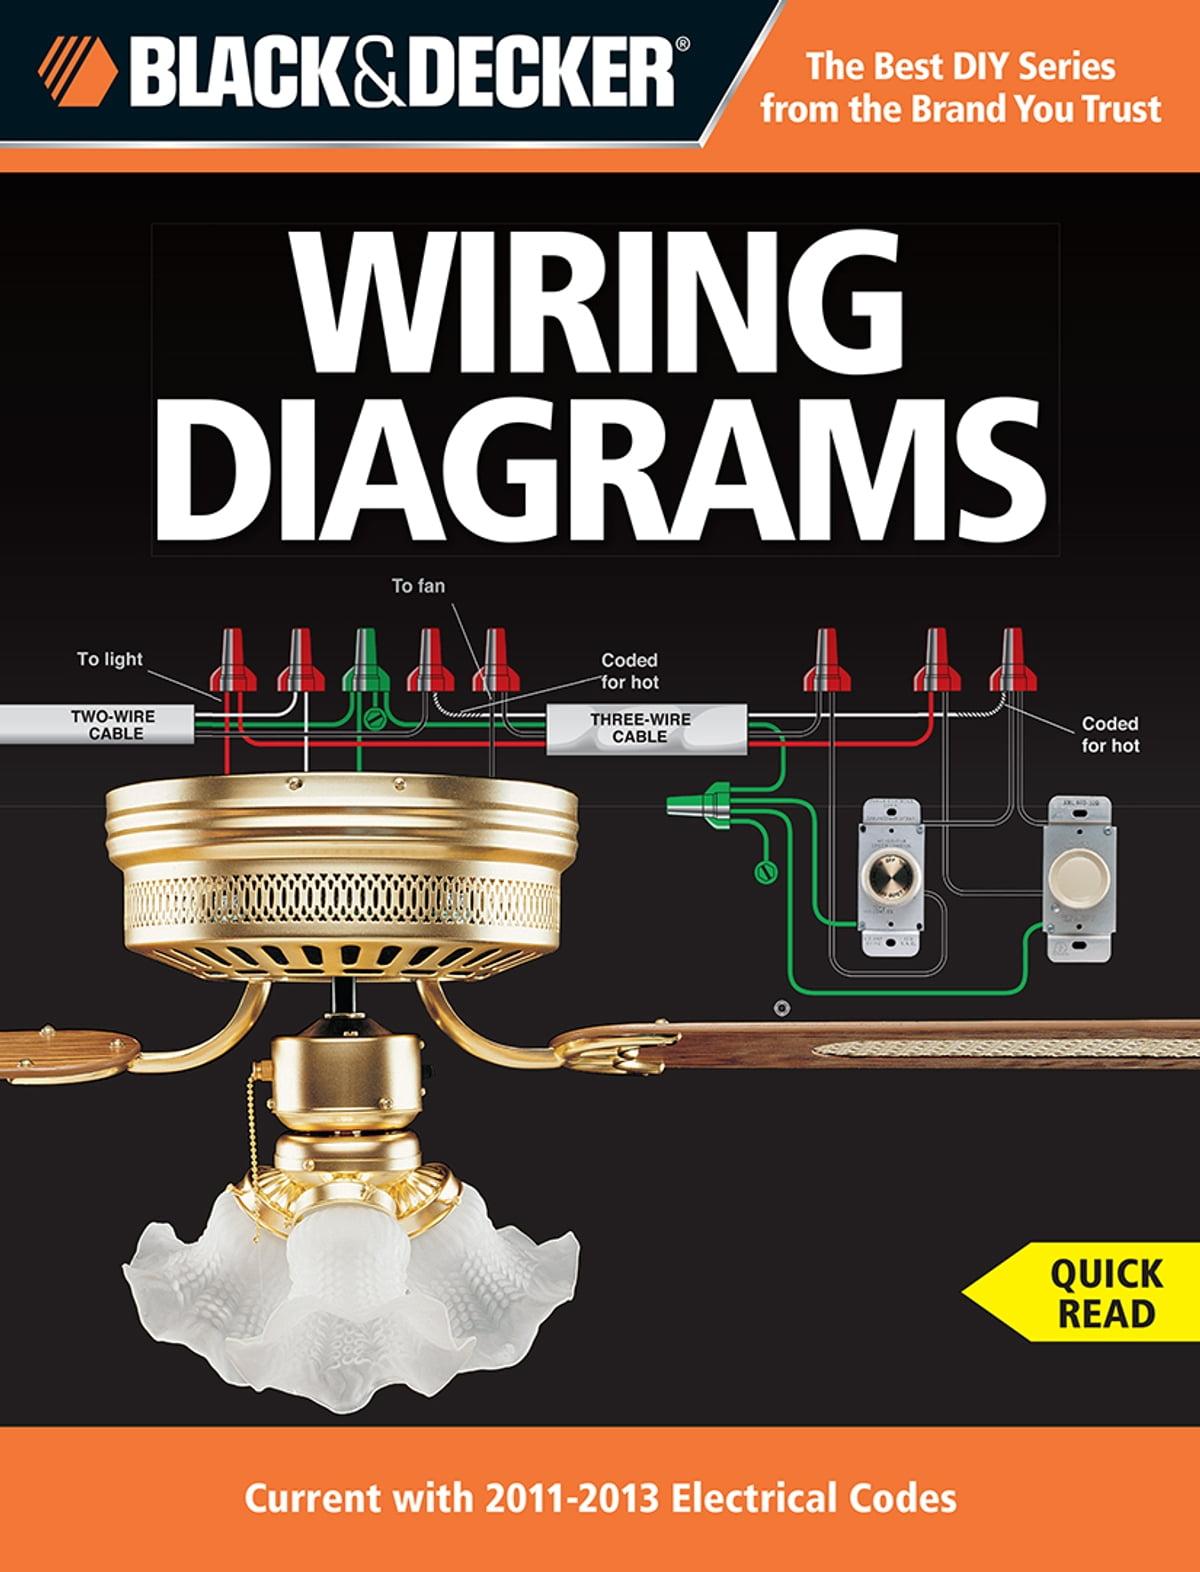 diy electrical wiring diagrams e46 m3 starter diagram black decker ebook by editors of cpi kobo rakuten